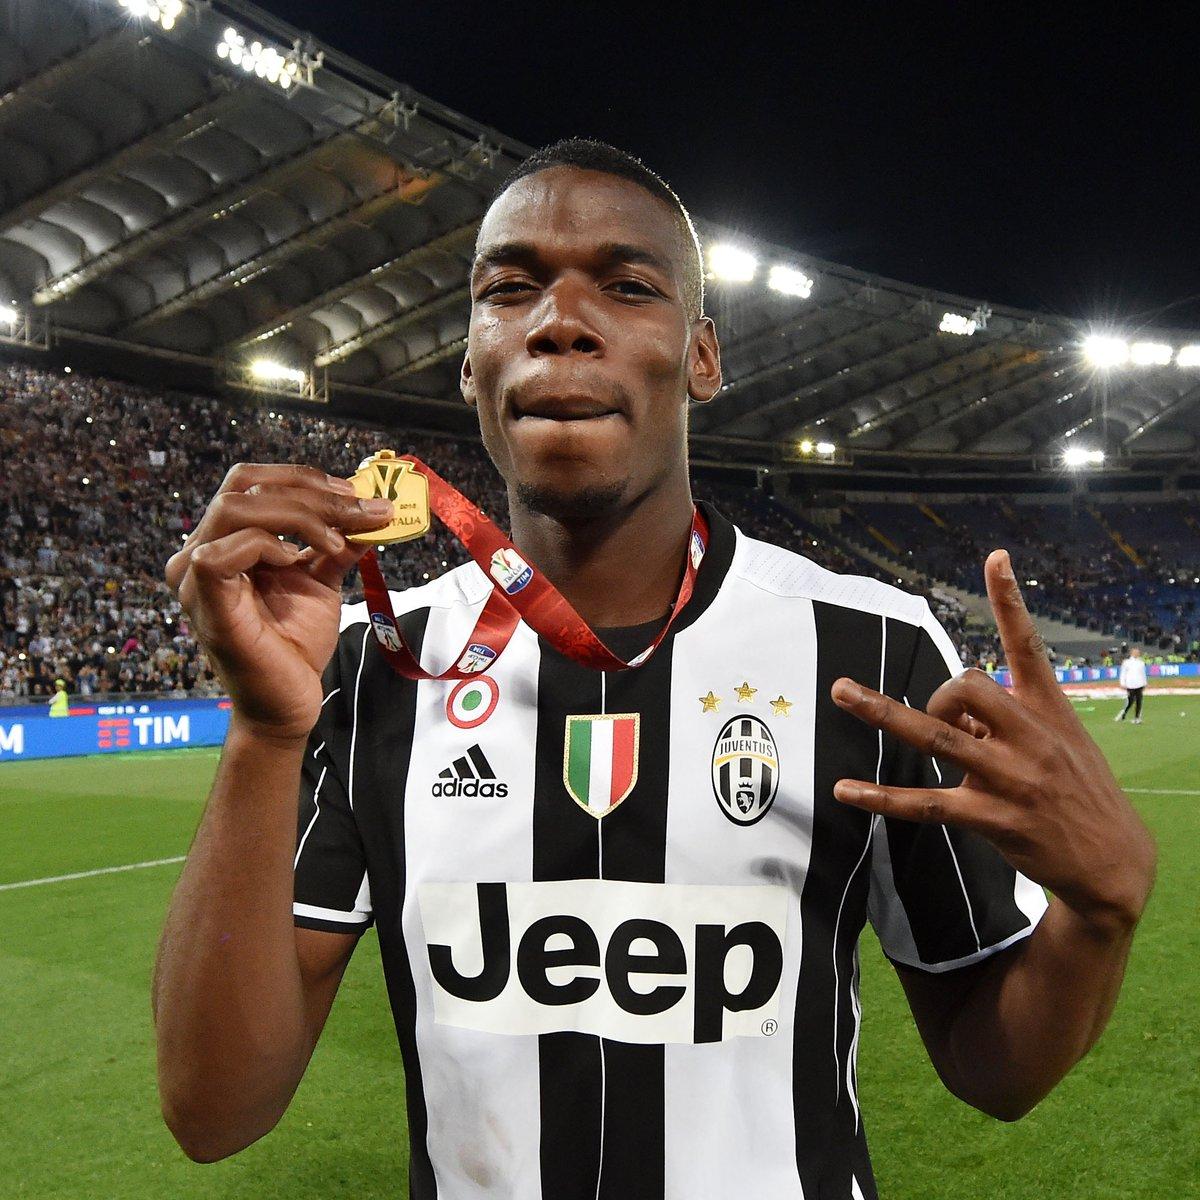 📅 #OnThisDay in 2️⃣0️⃣1️⃣2️⃣  @paulpogba joined Juventus 🤍🖤